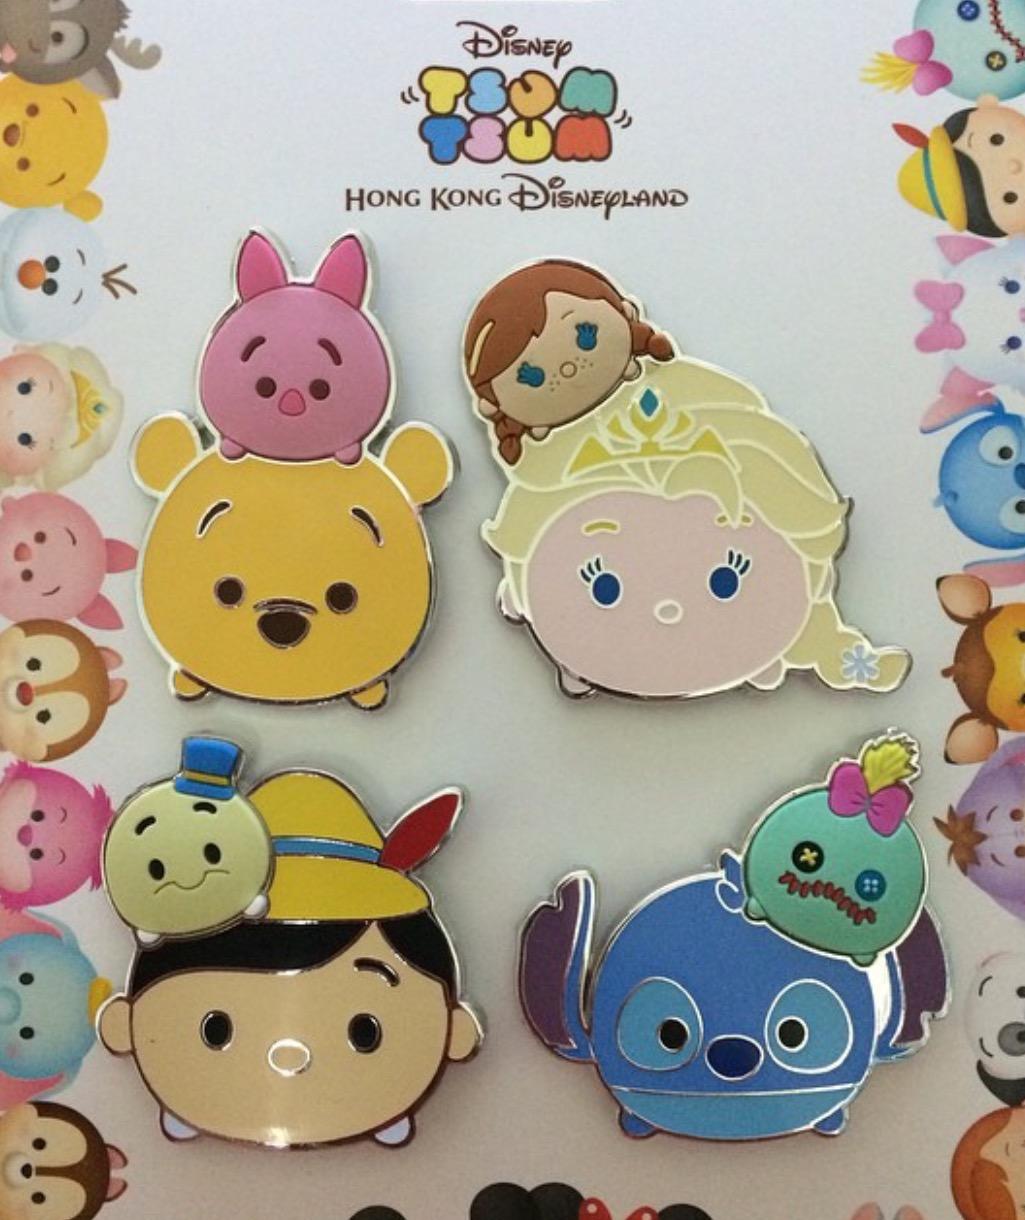 Buy Wall Stickers Online New Hkdr Tsum Tsum Pins Disney Pins Blog